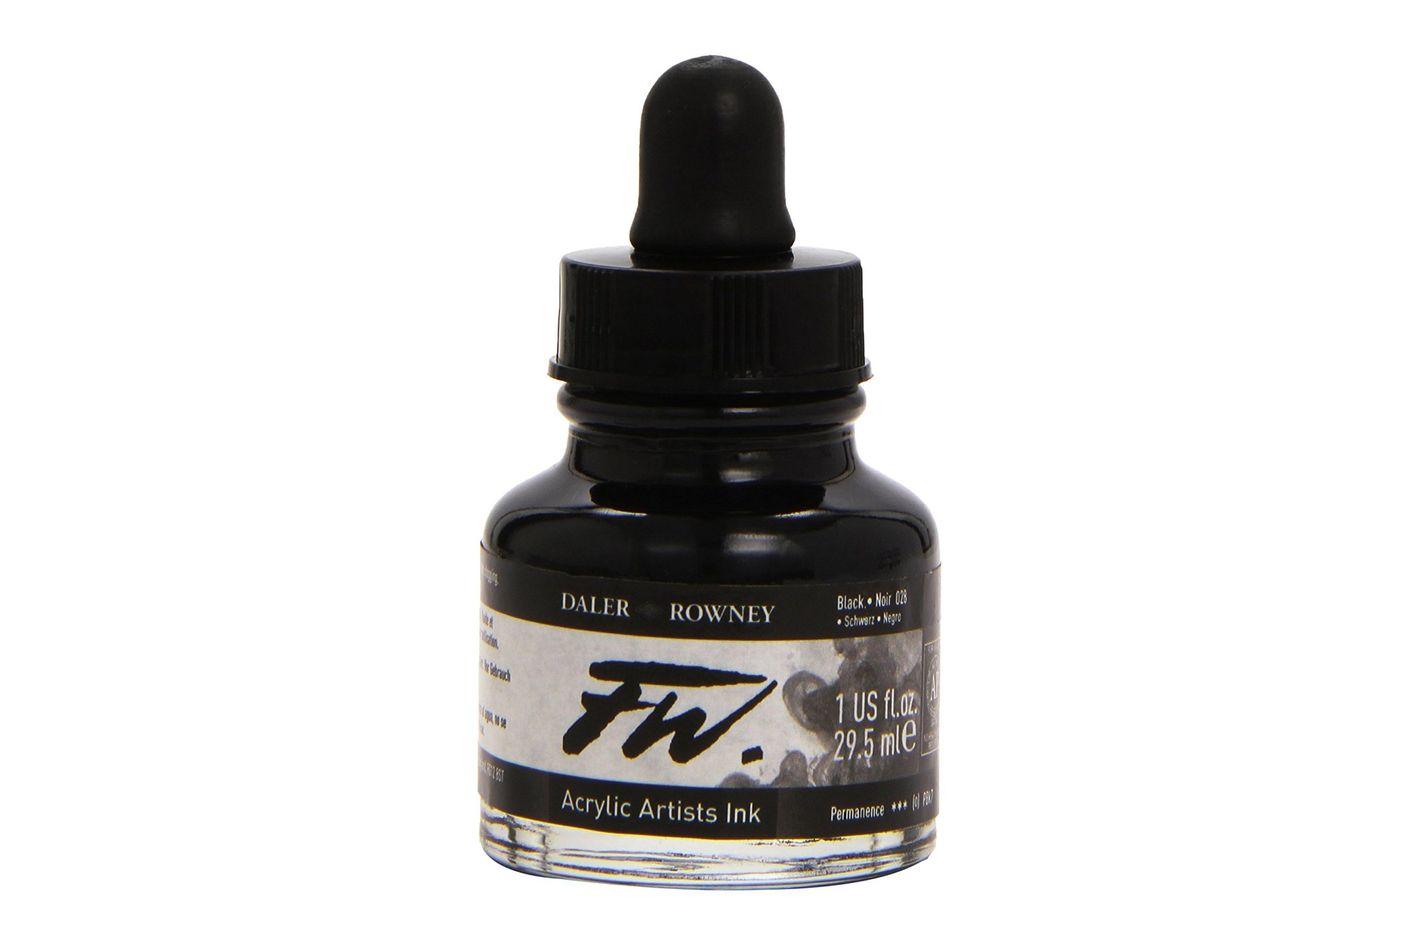 Daler-Rowney FW Acrylic Ink 1